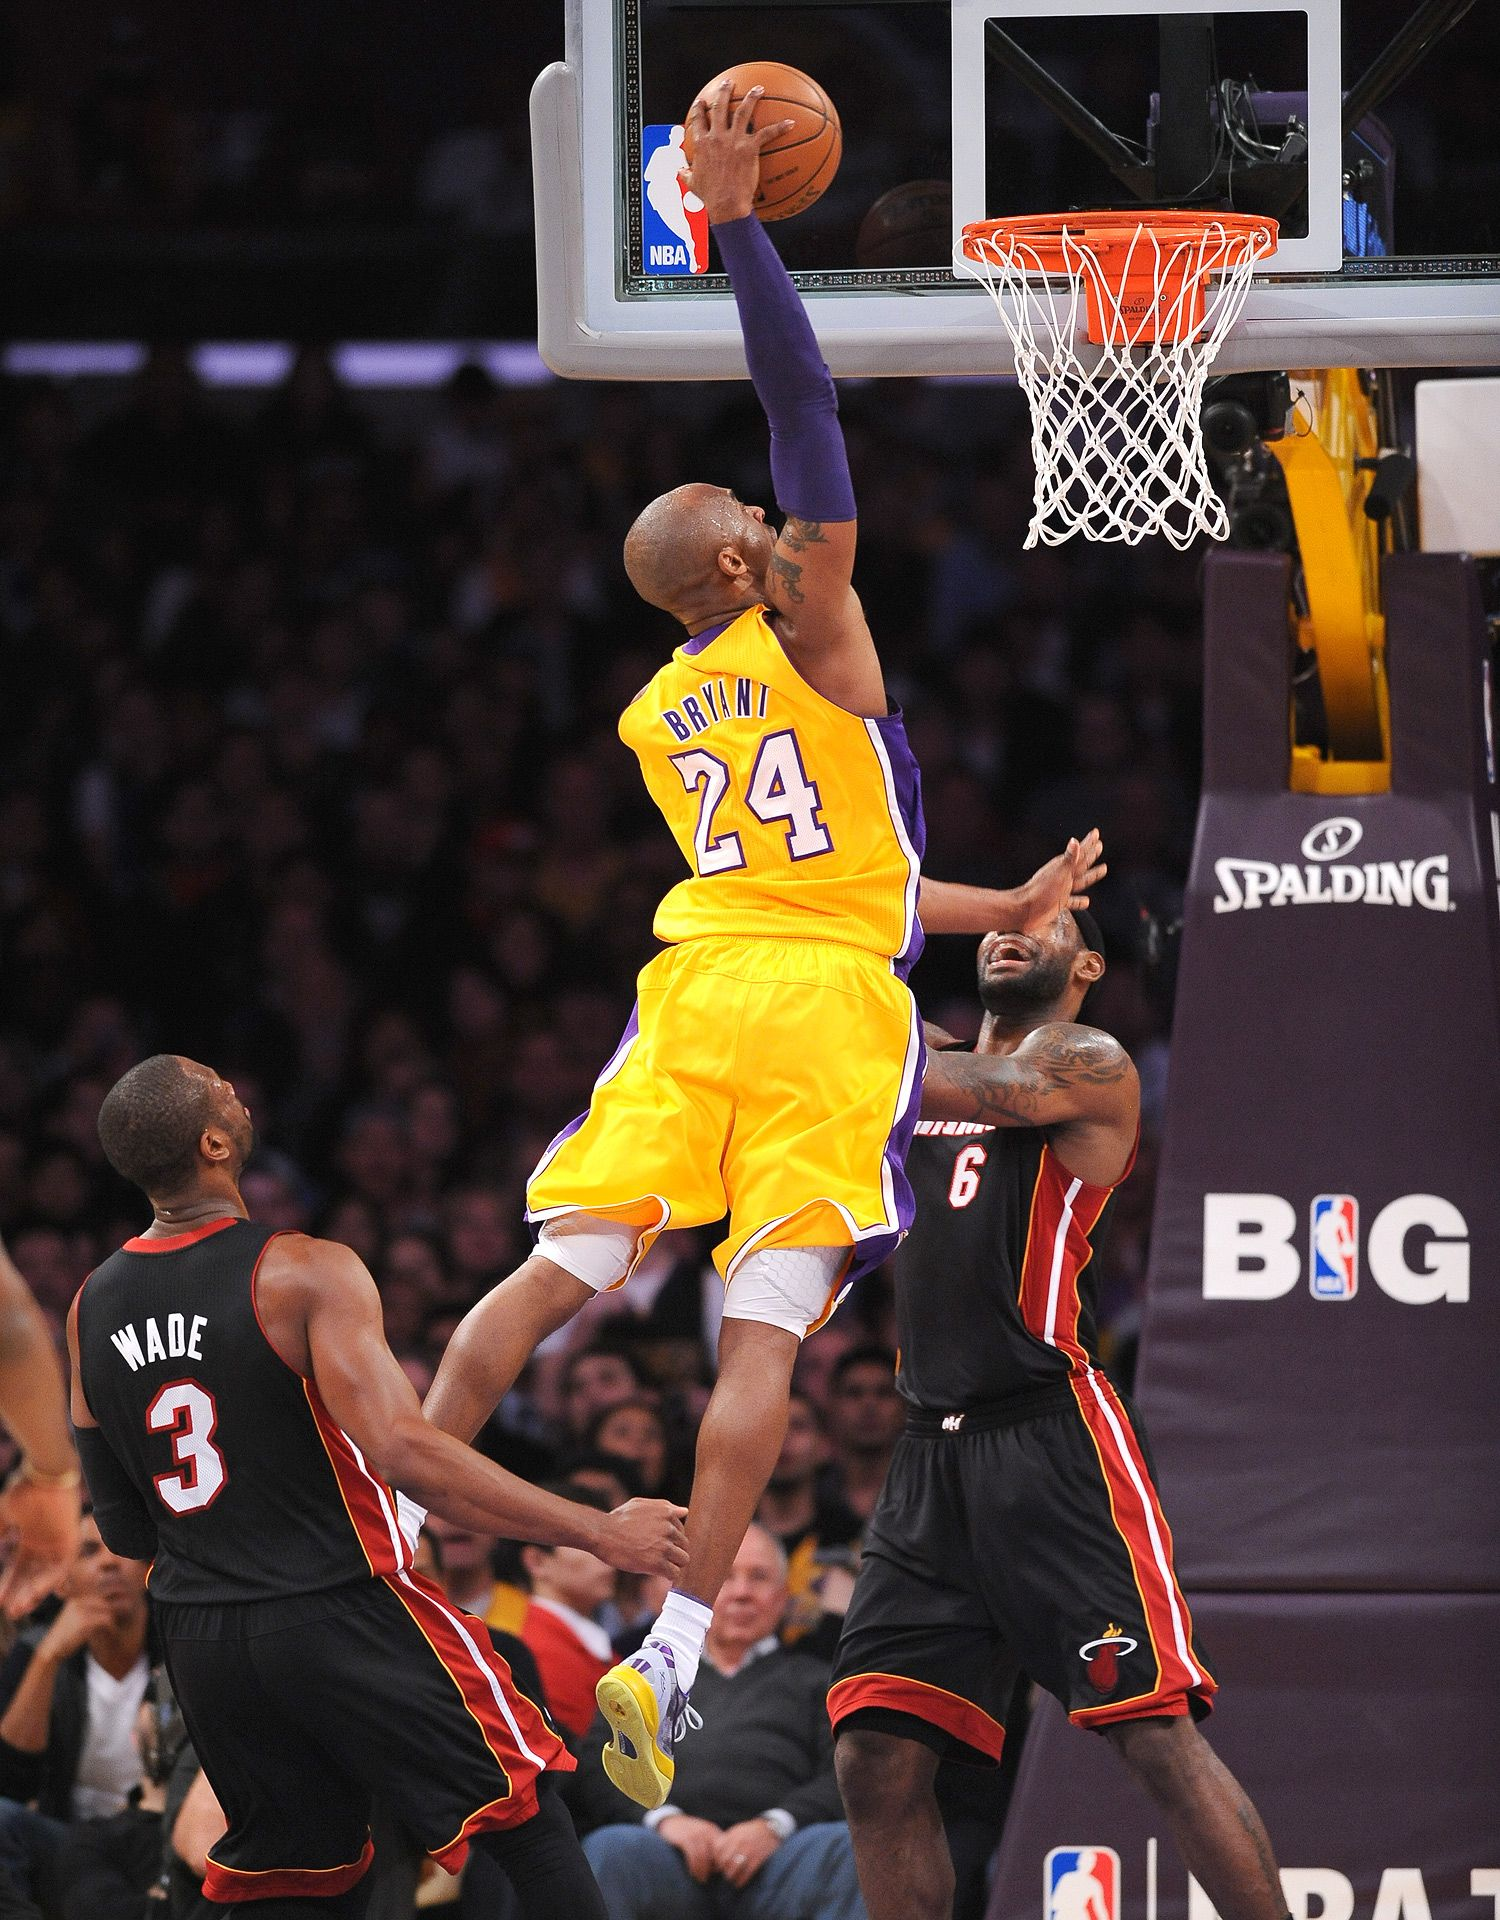 Hdwalli Com Kobe Bryant Wallpaper Kobe Bryant Dunk Kobe Bryant Pictures